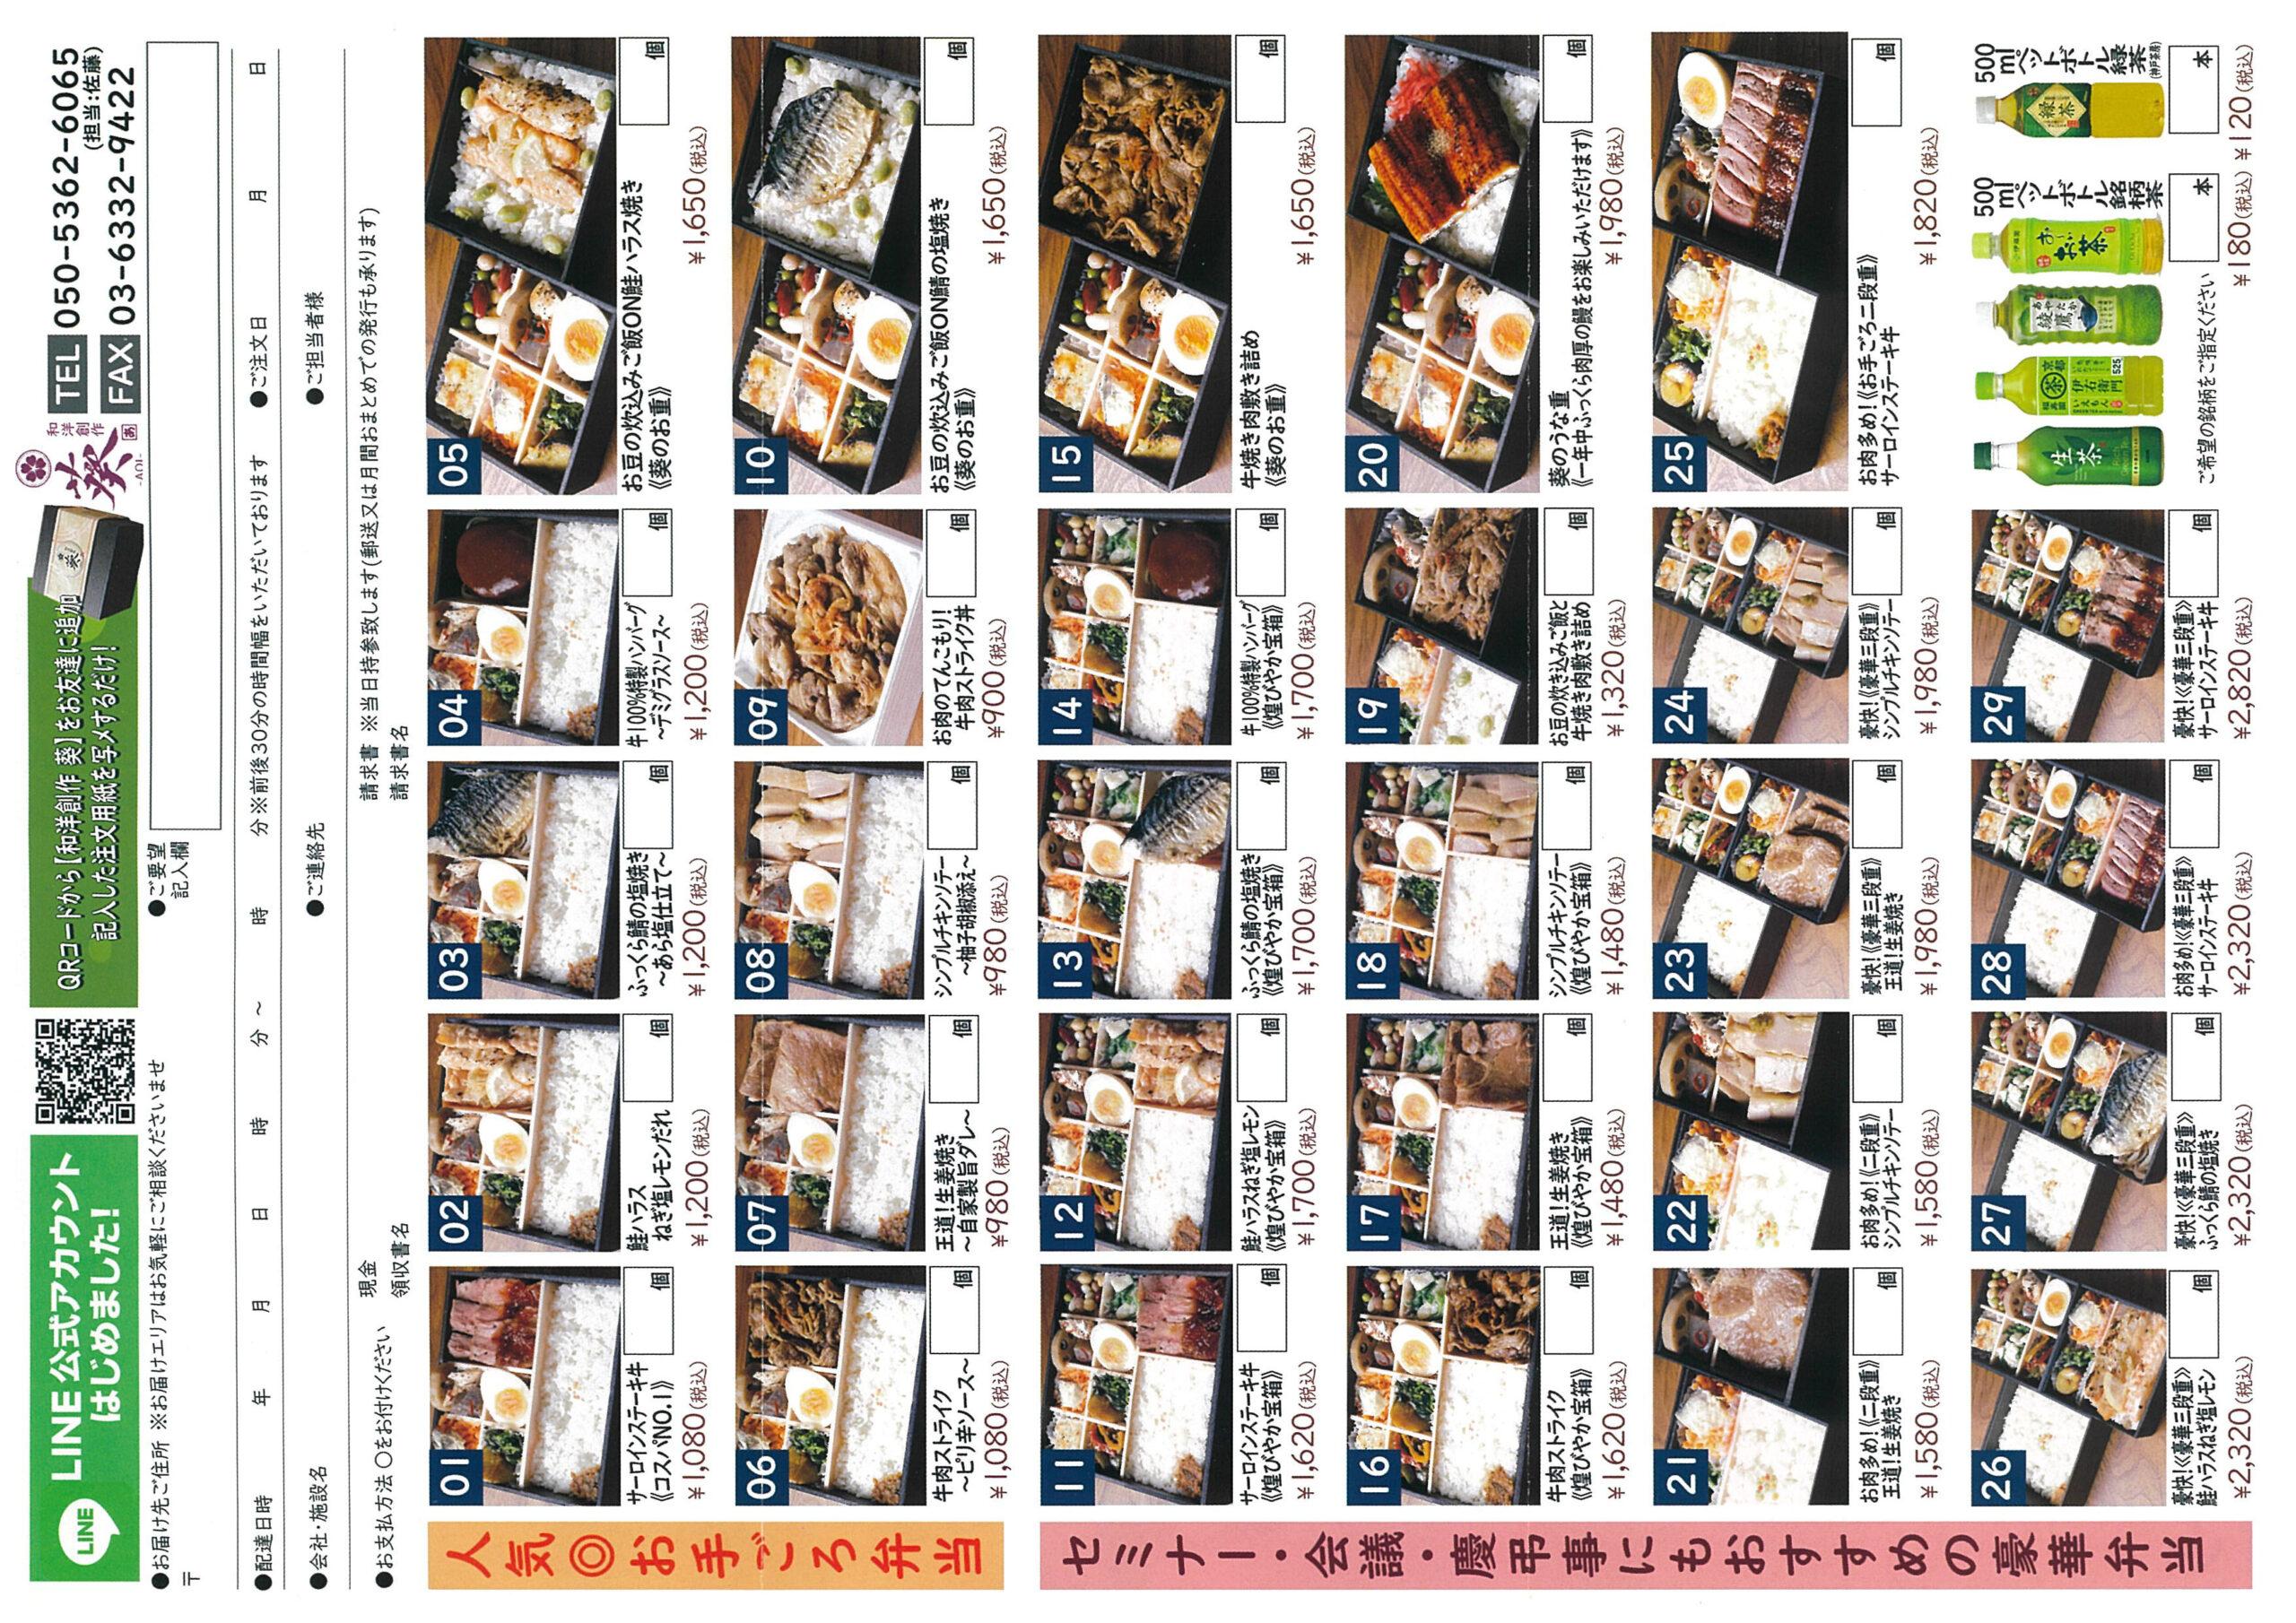 https://nakanobu.com/wp-content/uploads/2021/04/20210518150125-0001-scaled.jpg